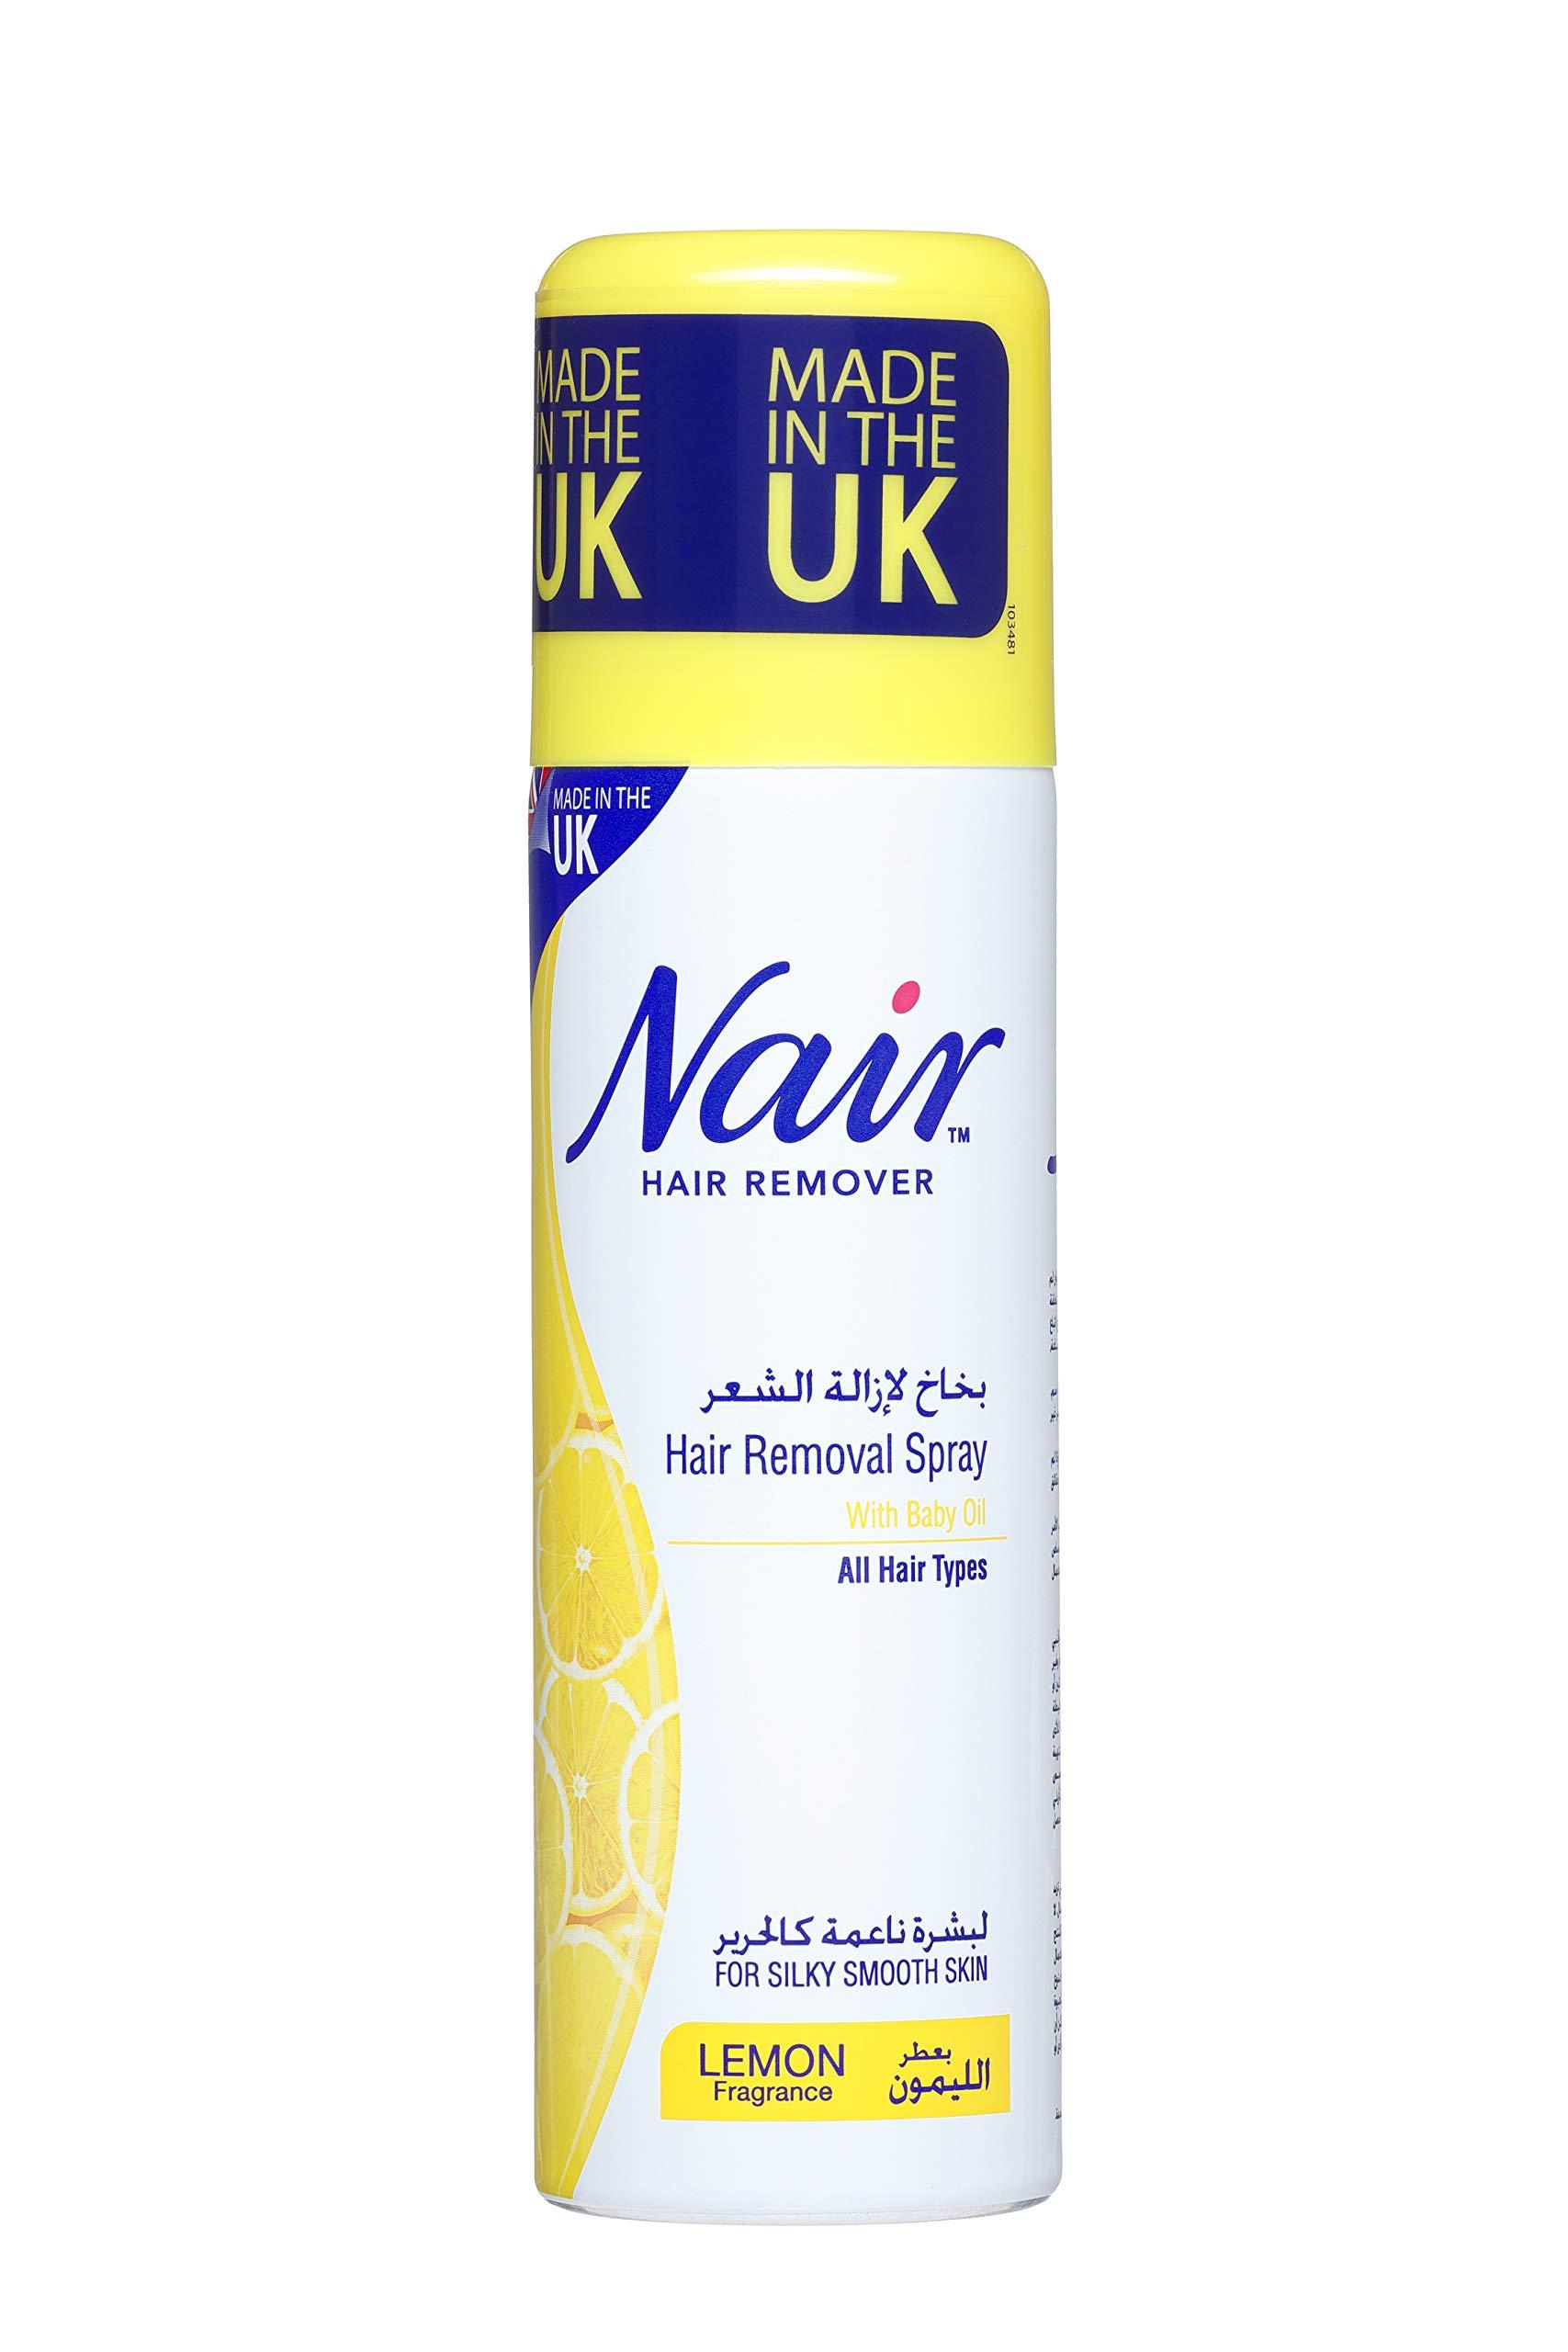 Nair Hair Removal Spray 200ml Lemon Buy Online In Gibraltar